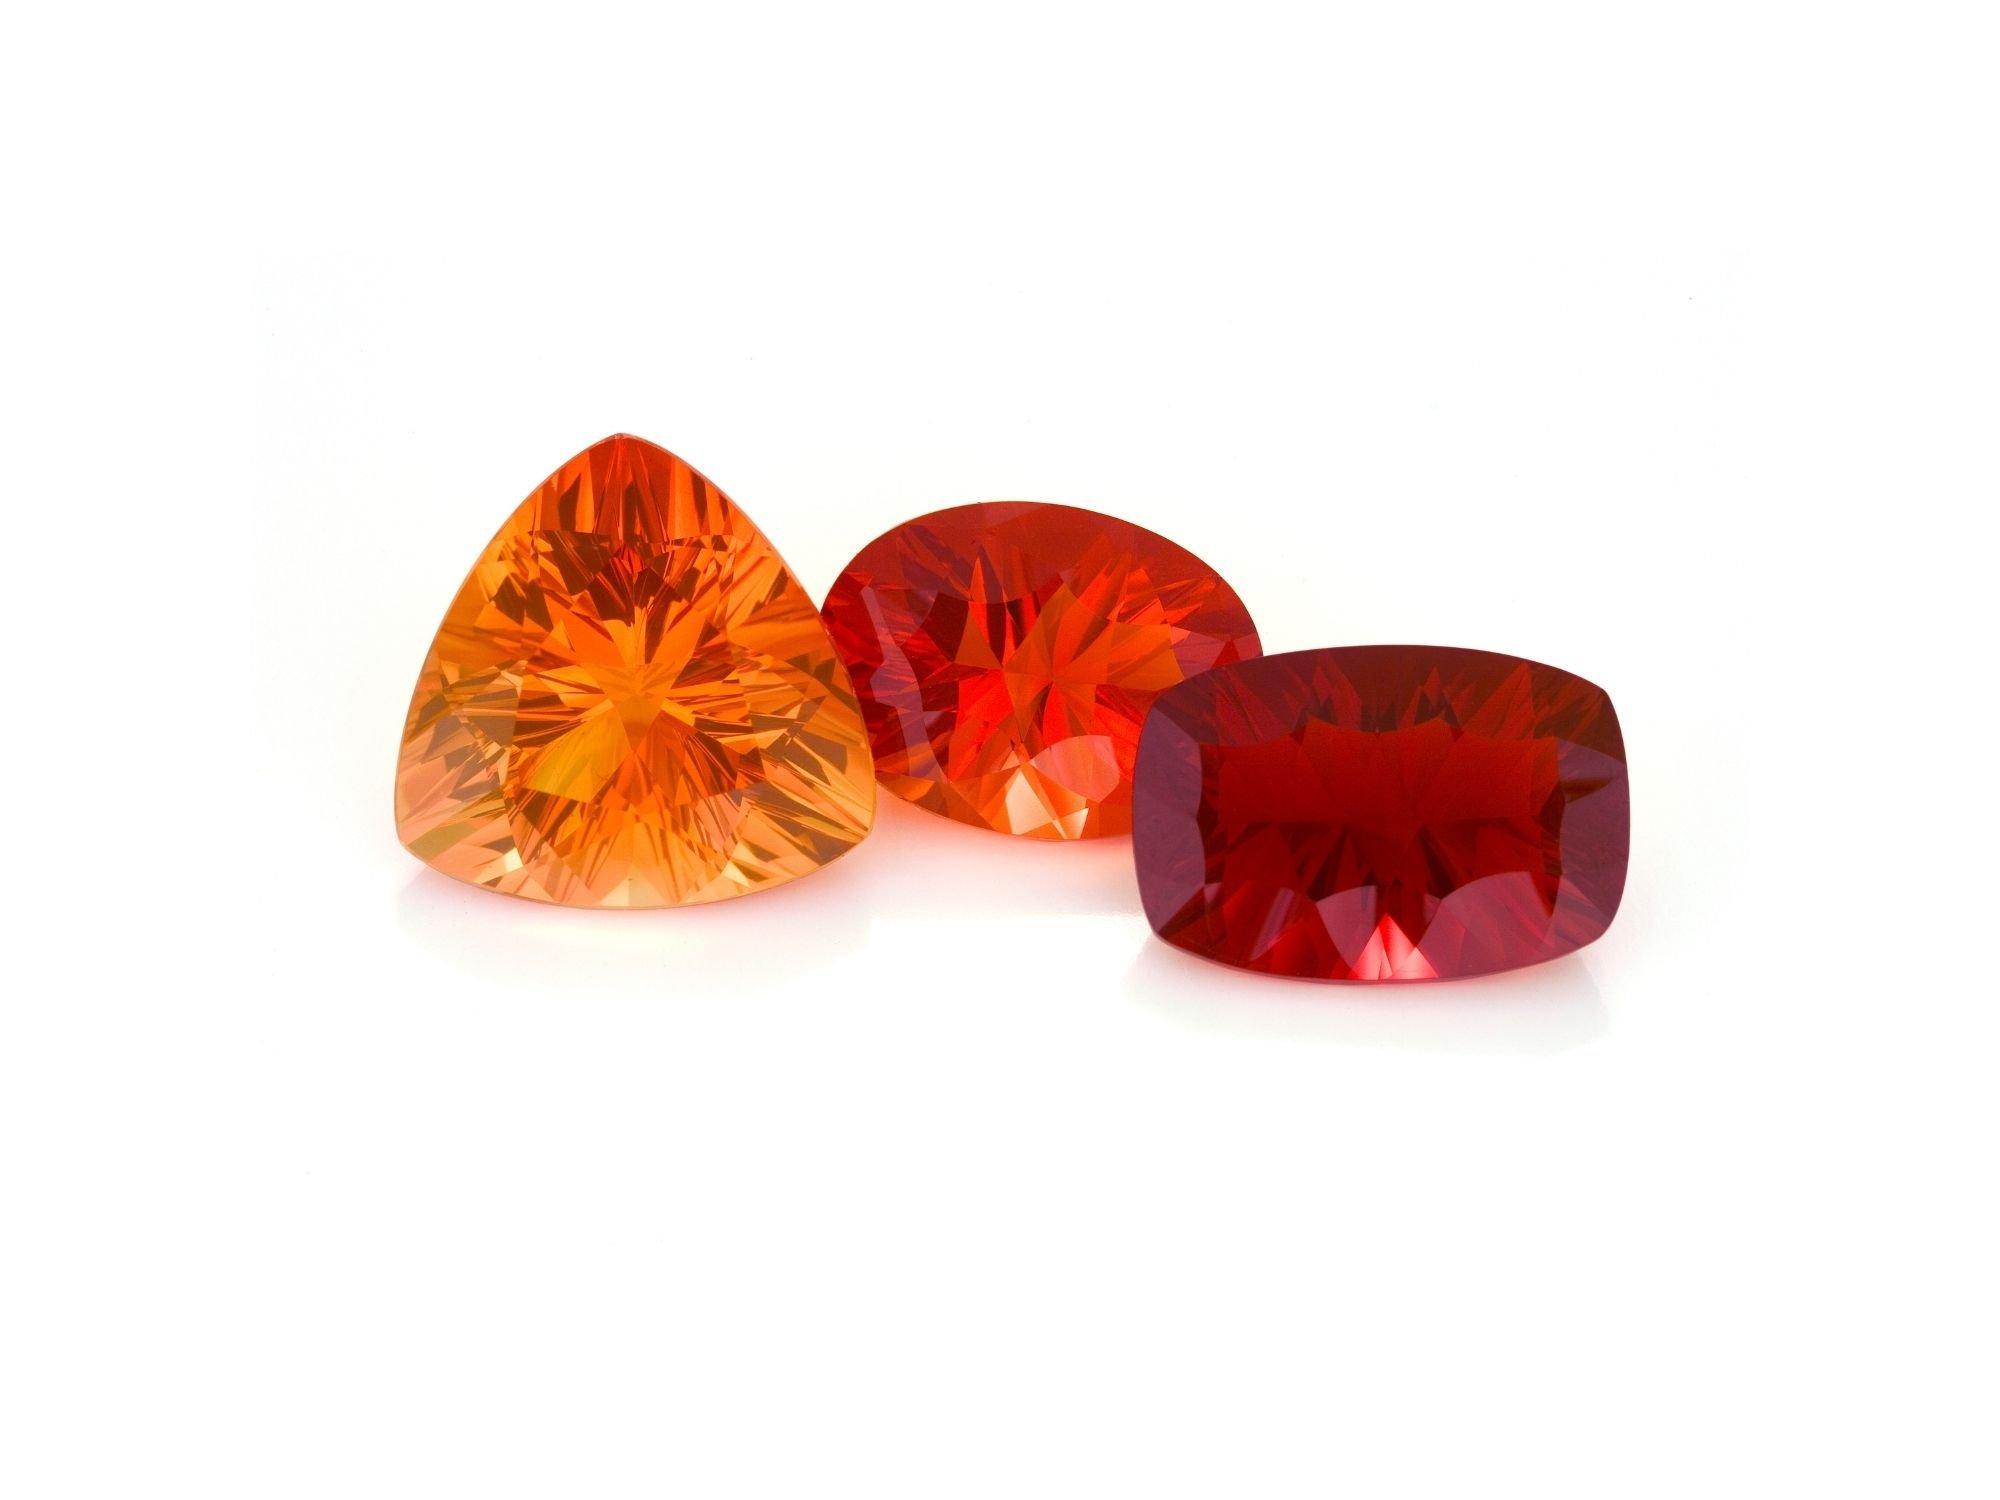 Fire Opal Cut And Shape | Diamond Buzz